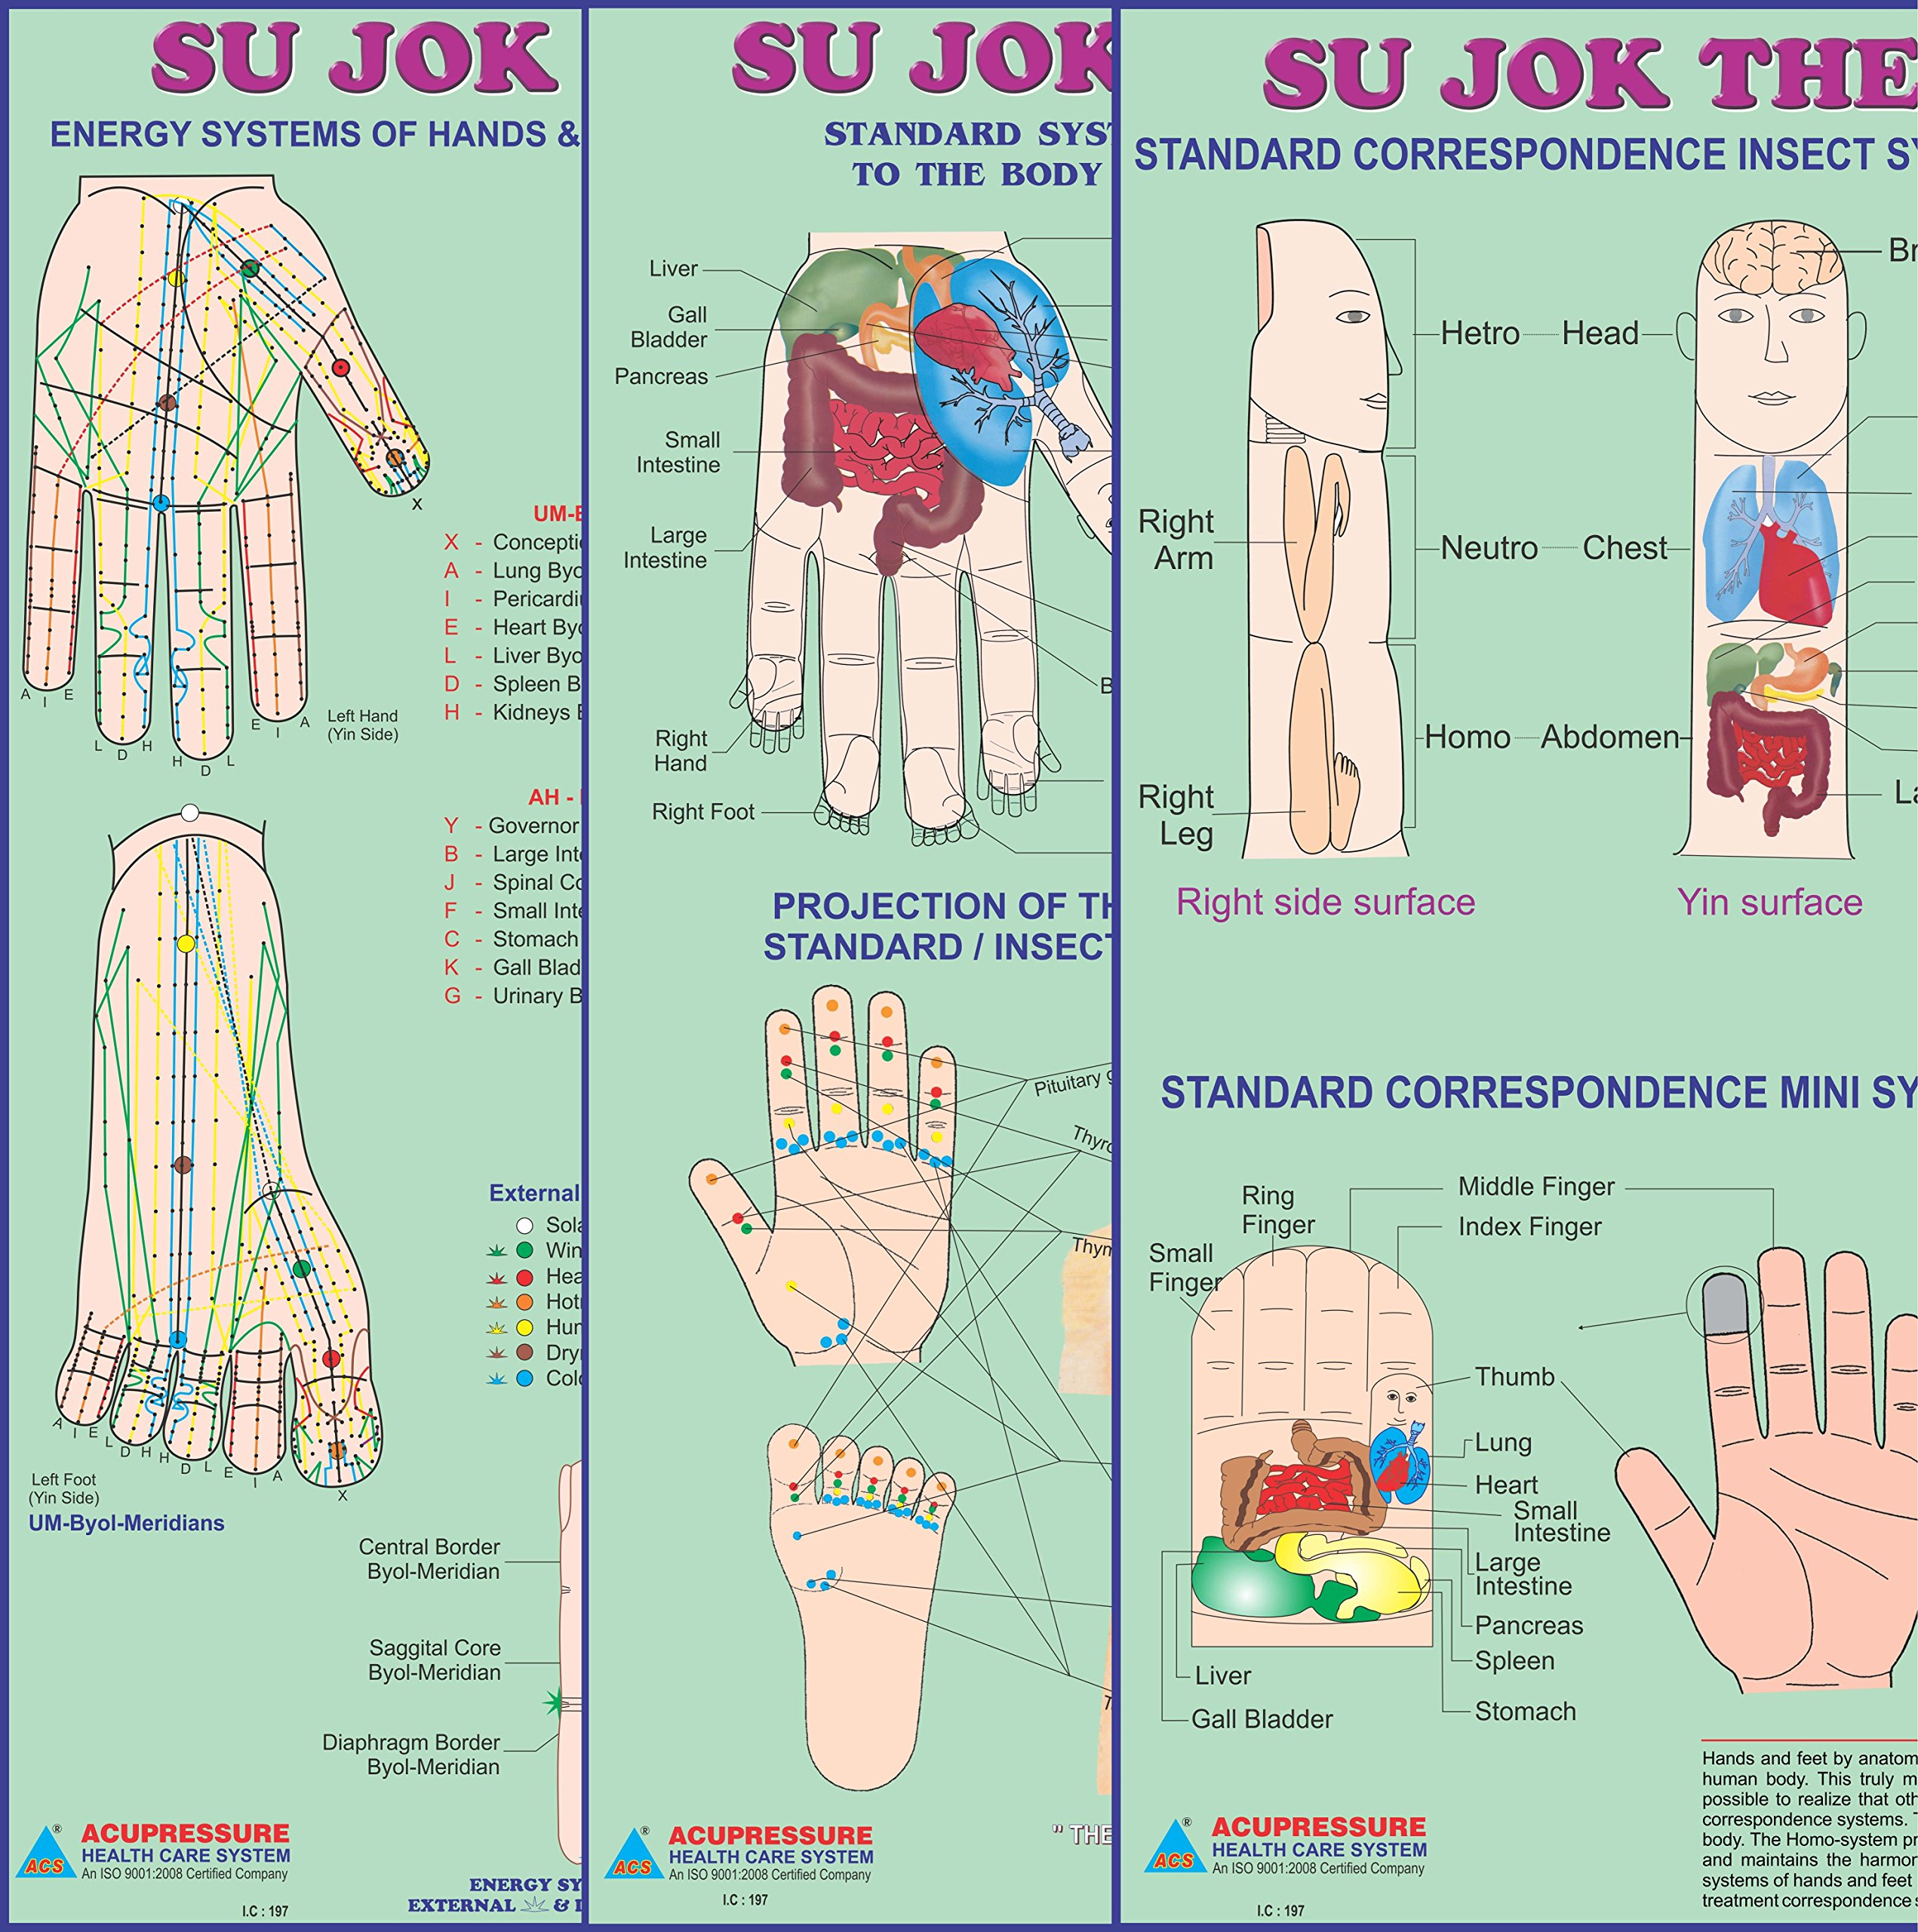 Acupressure Sujok Therapy - Acupuncture Acupressure Points